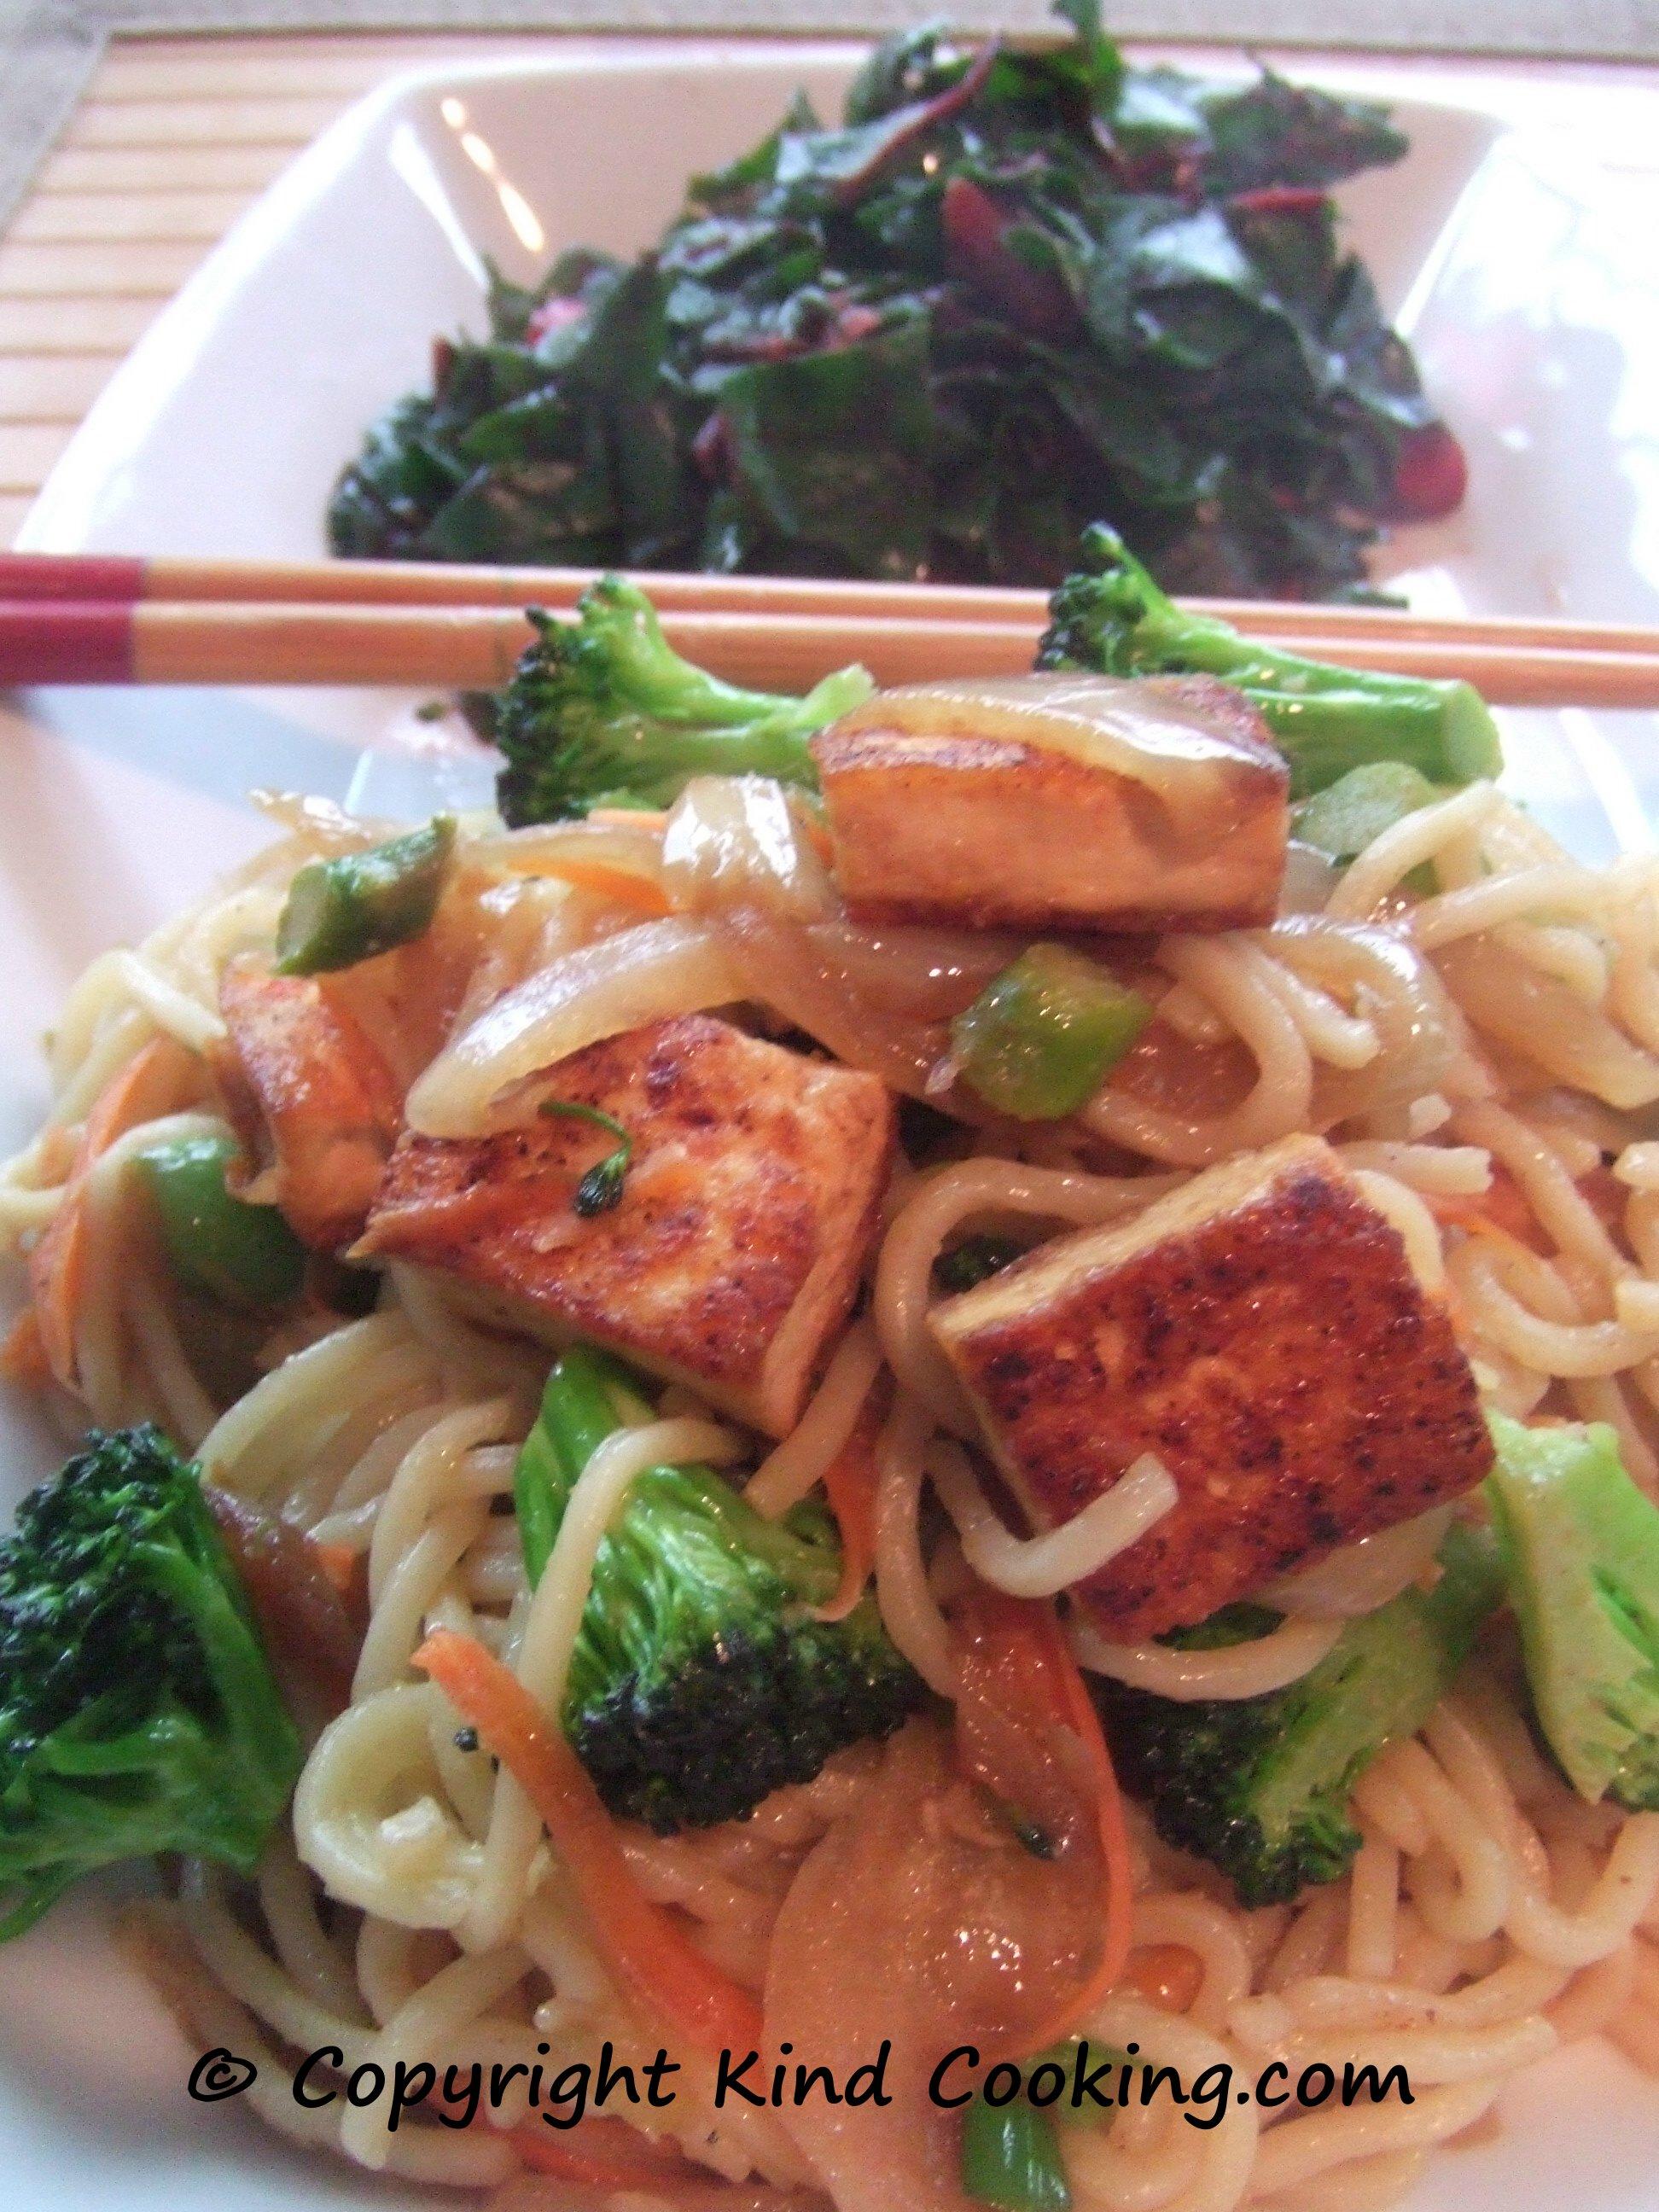 Stir-fry with yakisoba noodles